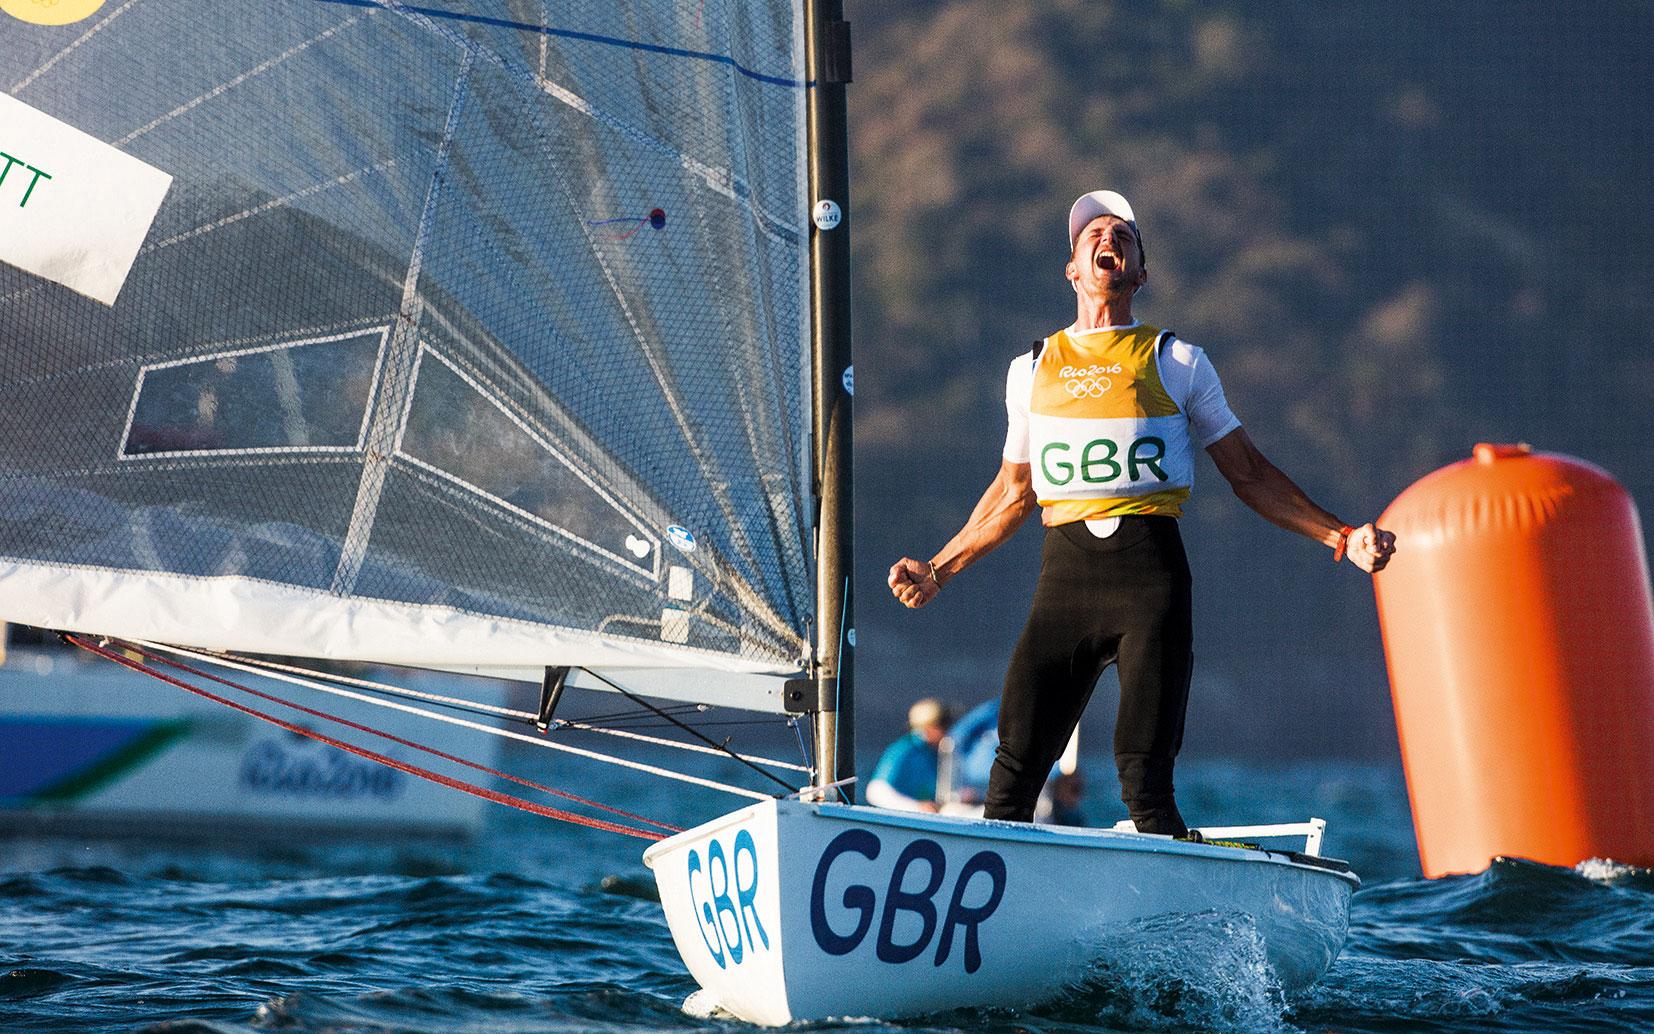 Olympic sailing: How to follow the Tokyo 2020 regatta YAW263.giles scott.1u4a0804 BB Yacht Charter Marbella